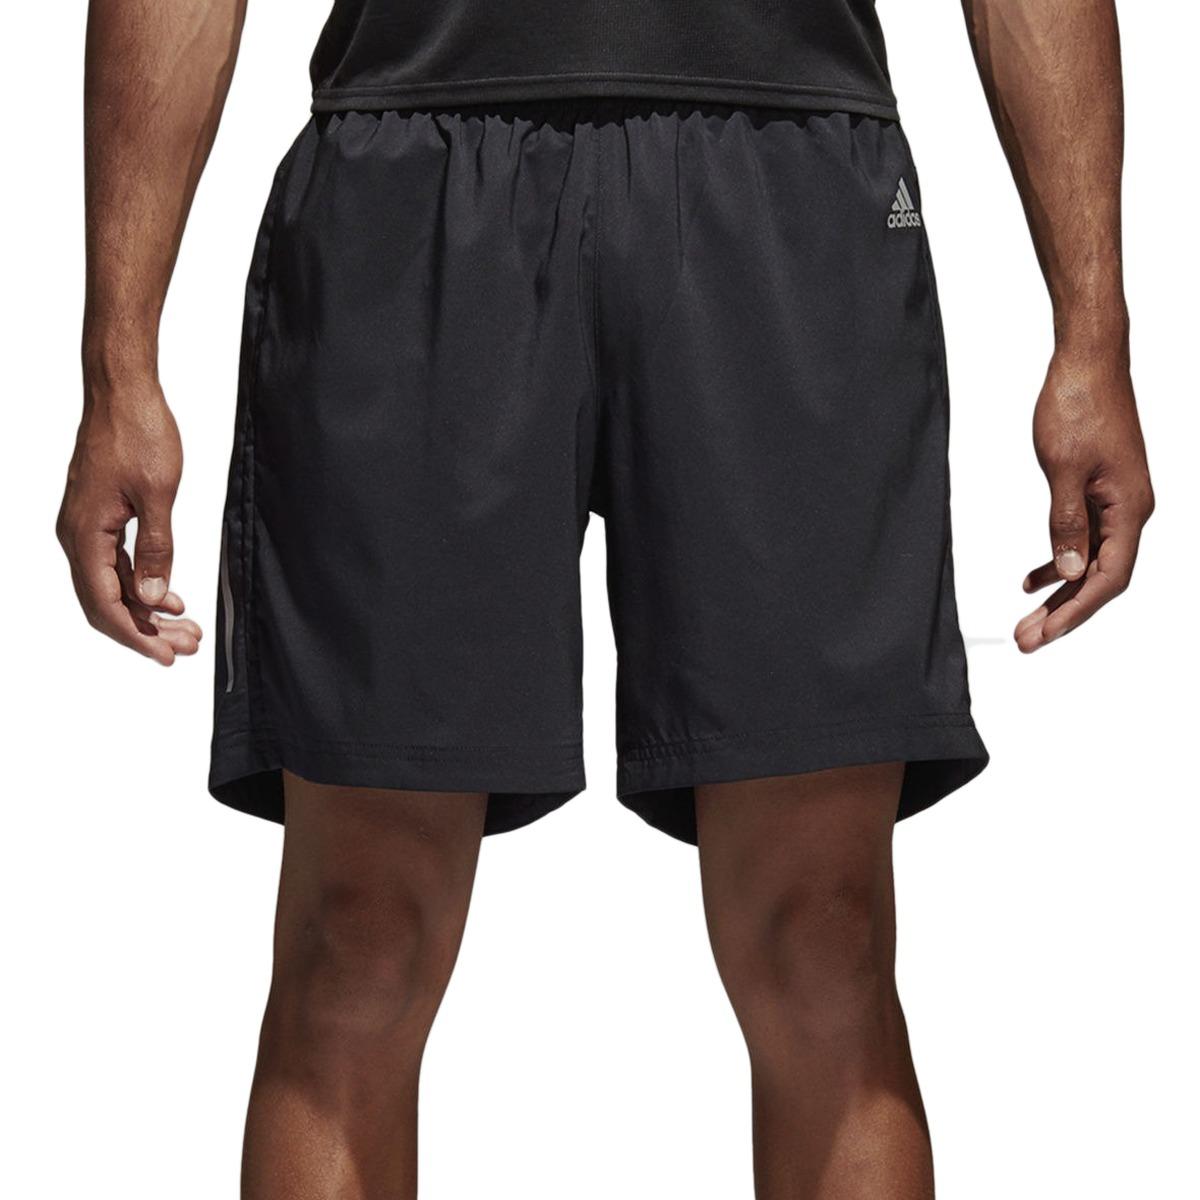 1 Running 399 Hombre Adidas Mercado Libre En Short Ng 00 vIyA1W